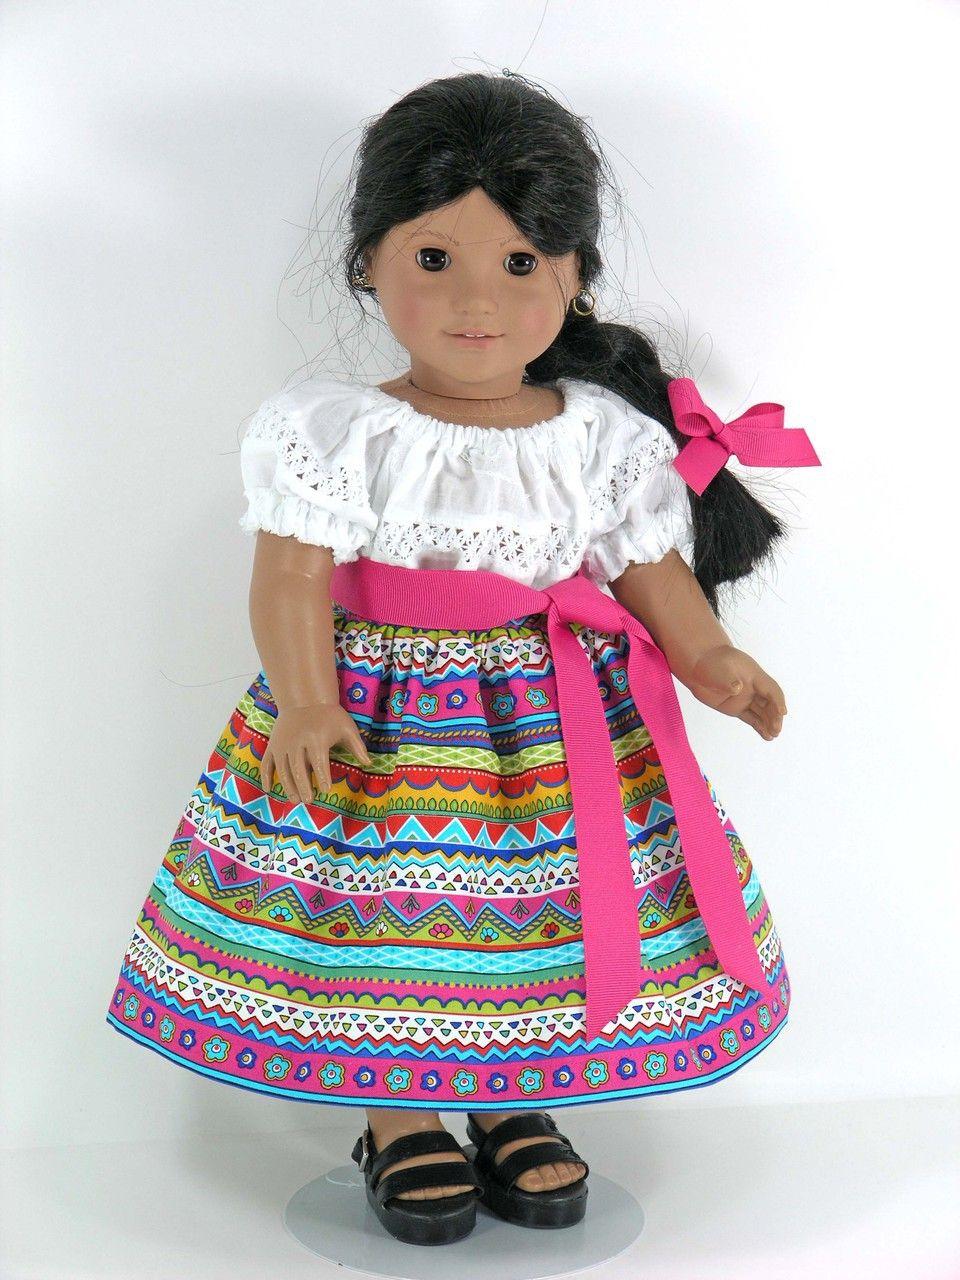 american girl doll clothes for josefina camisa skirt sash pantalettes hair ribbon. Black Bedroom Furniture Sets. Home Design Ideas